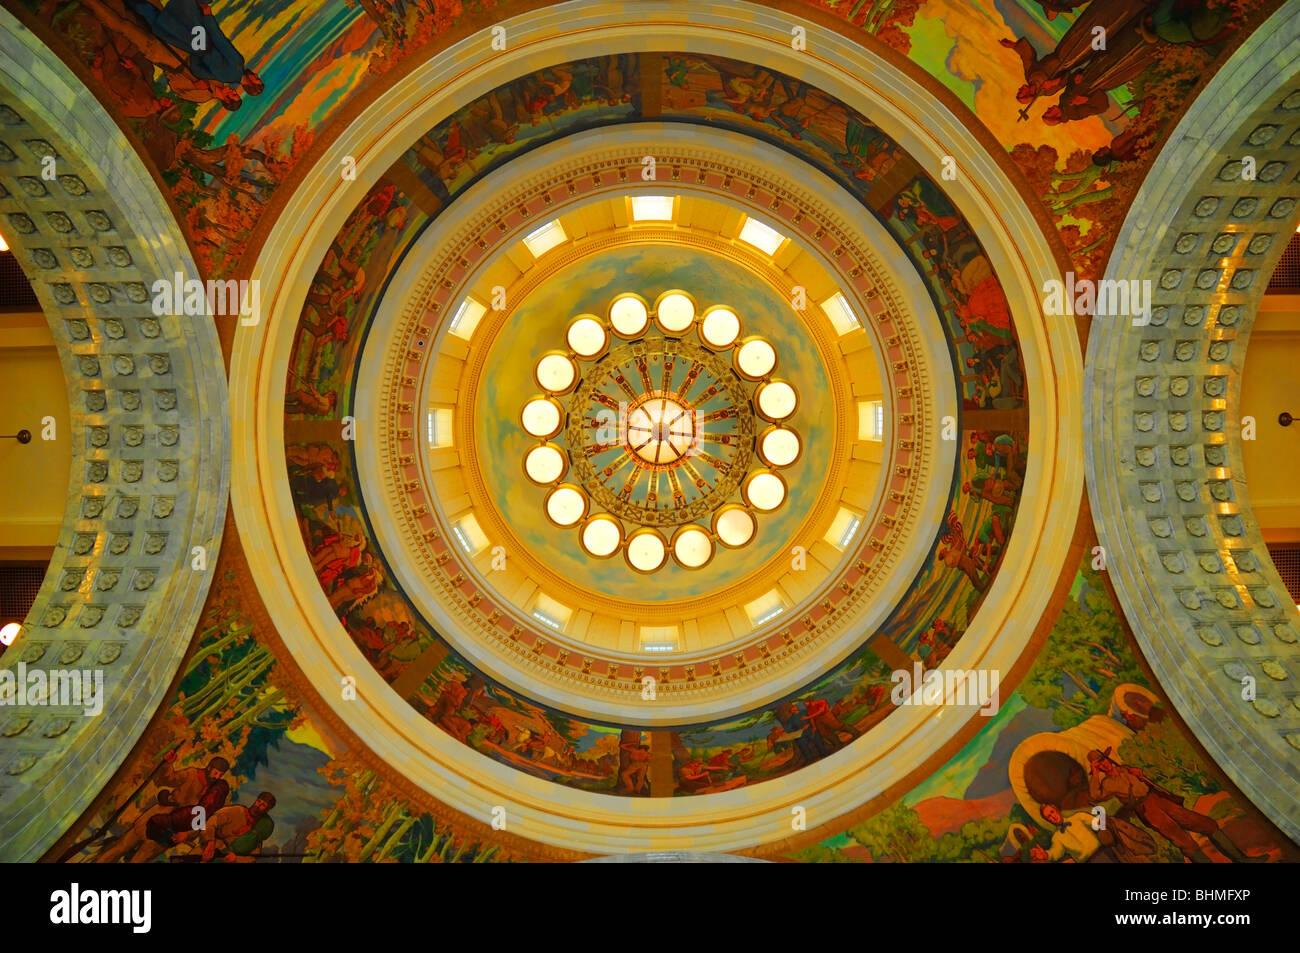 Inside view of the cupola or dome at Utah State Capitol building in Salt Lake City, Utah, USA - Stock Image